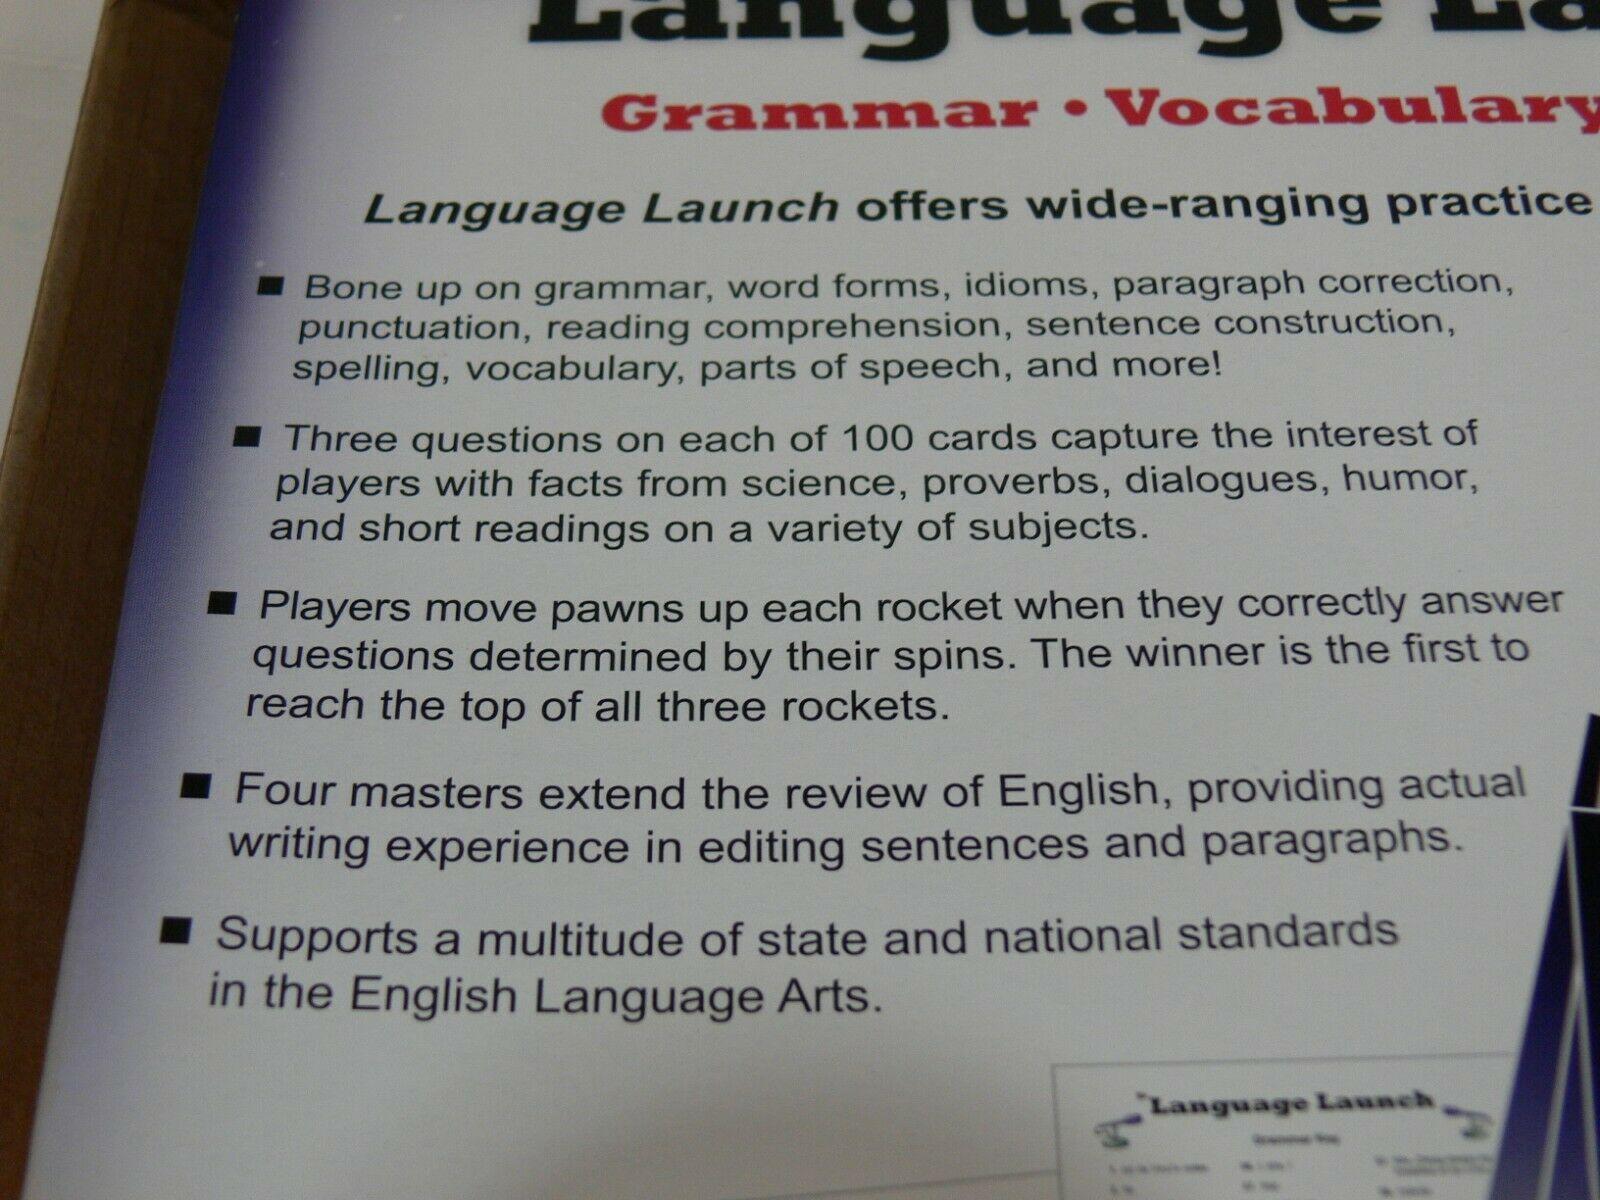 Language Launch Rocket Educational Game - ELL ESL Grammar Vocabulary Writing ek image 4